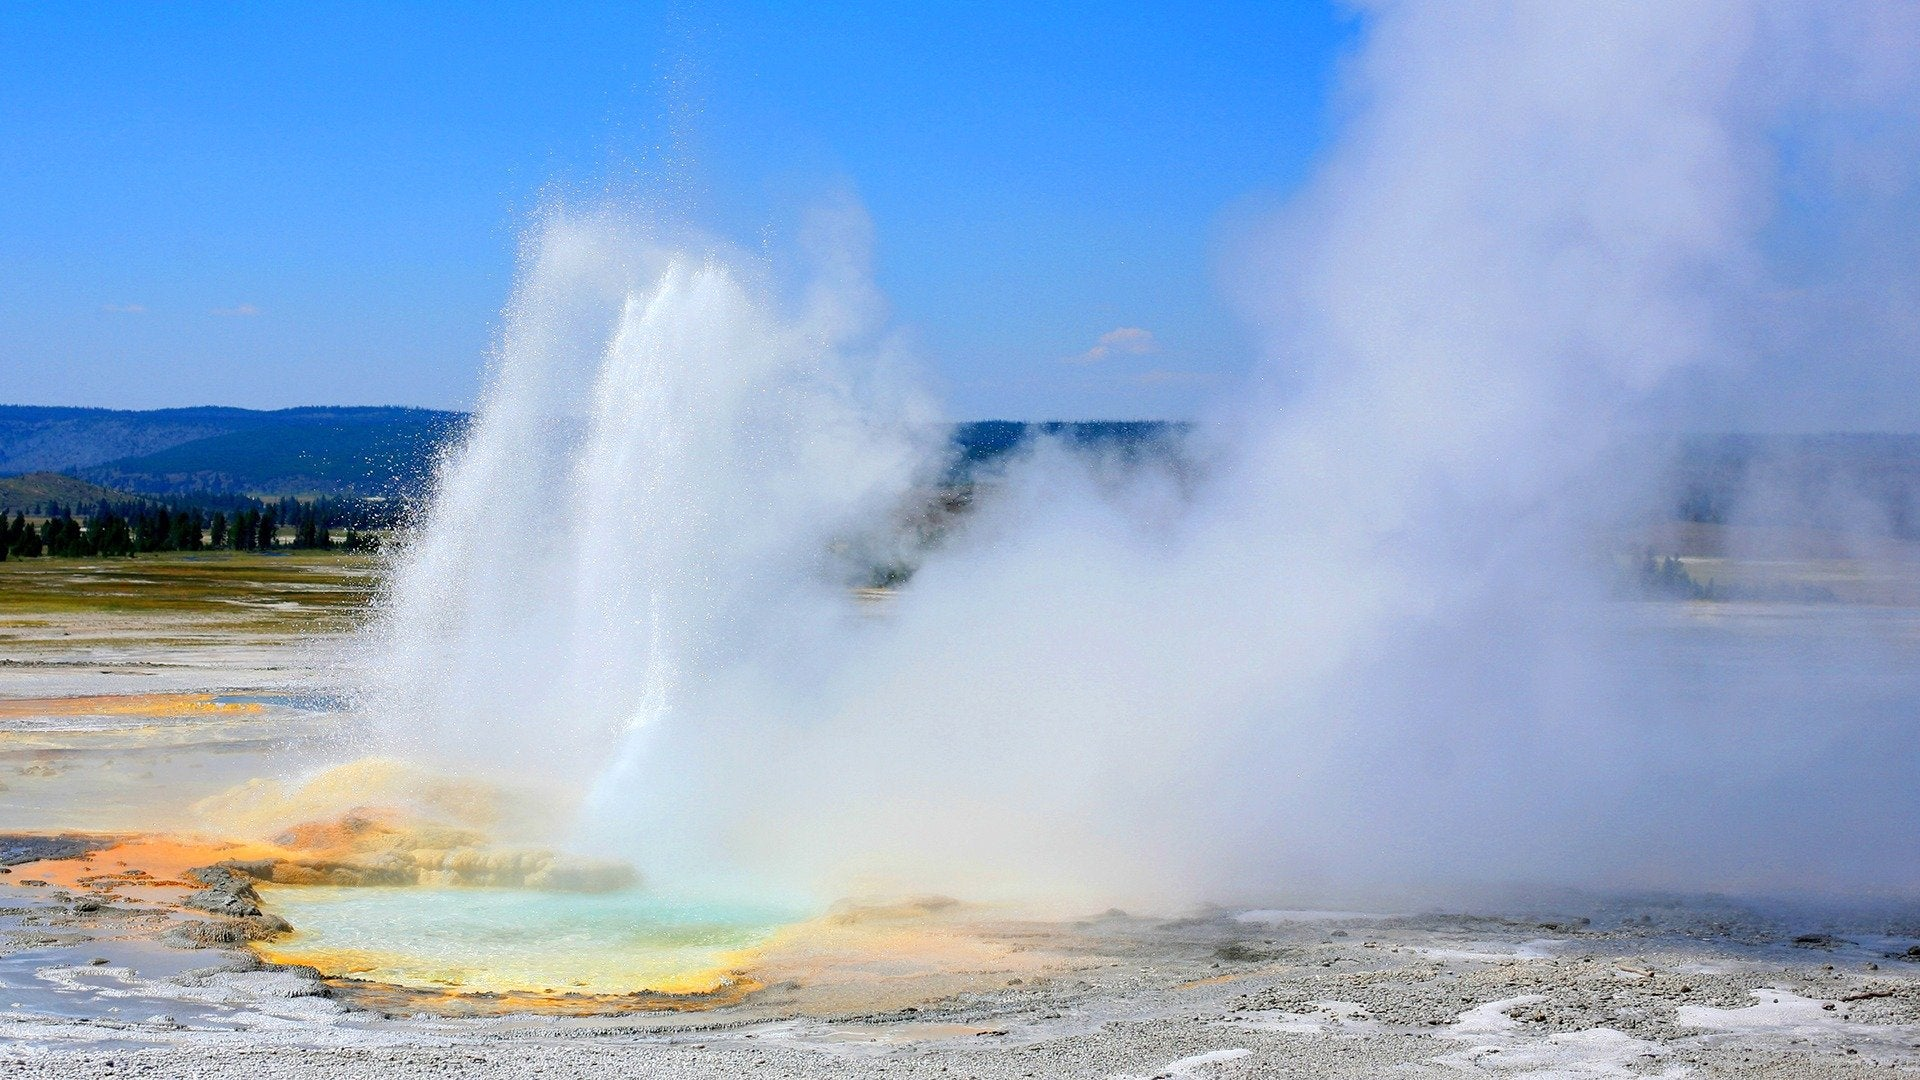 Planet Earth: Yellowstone